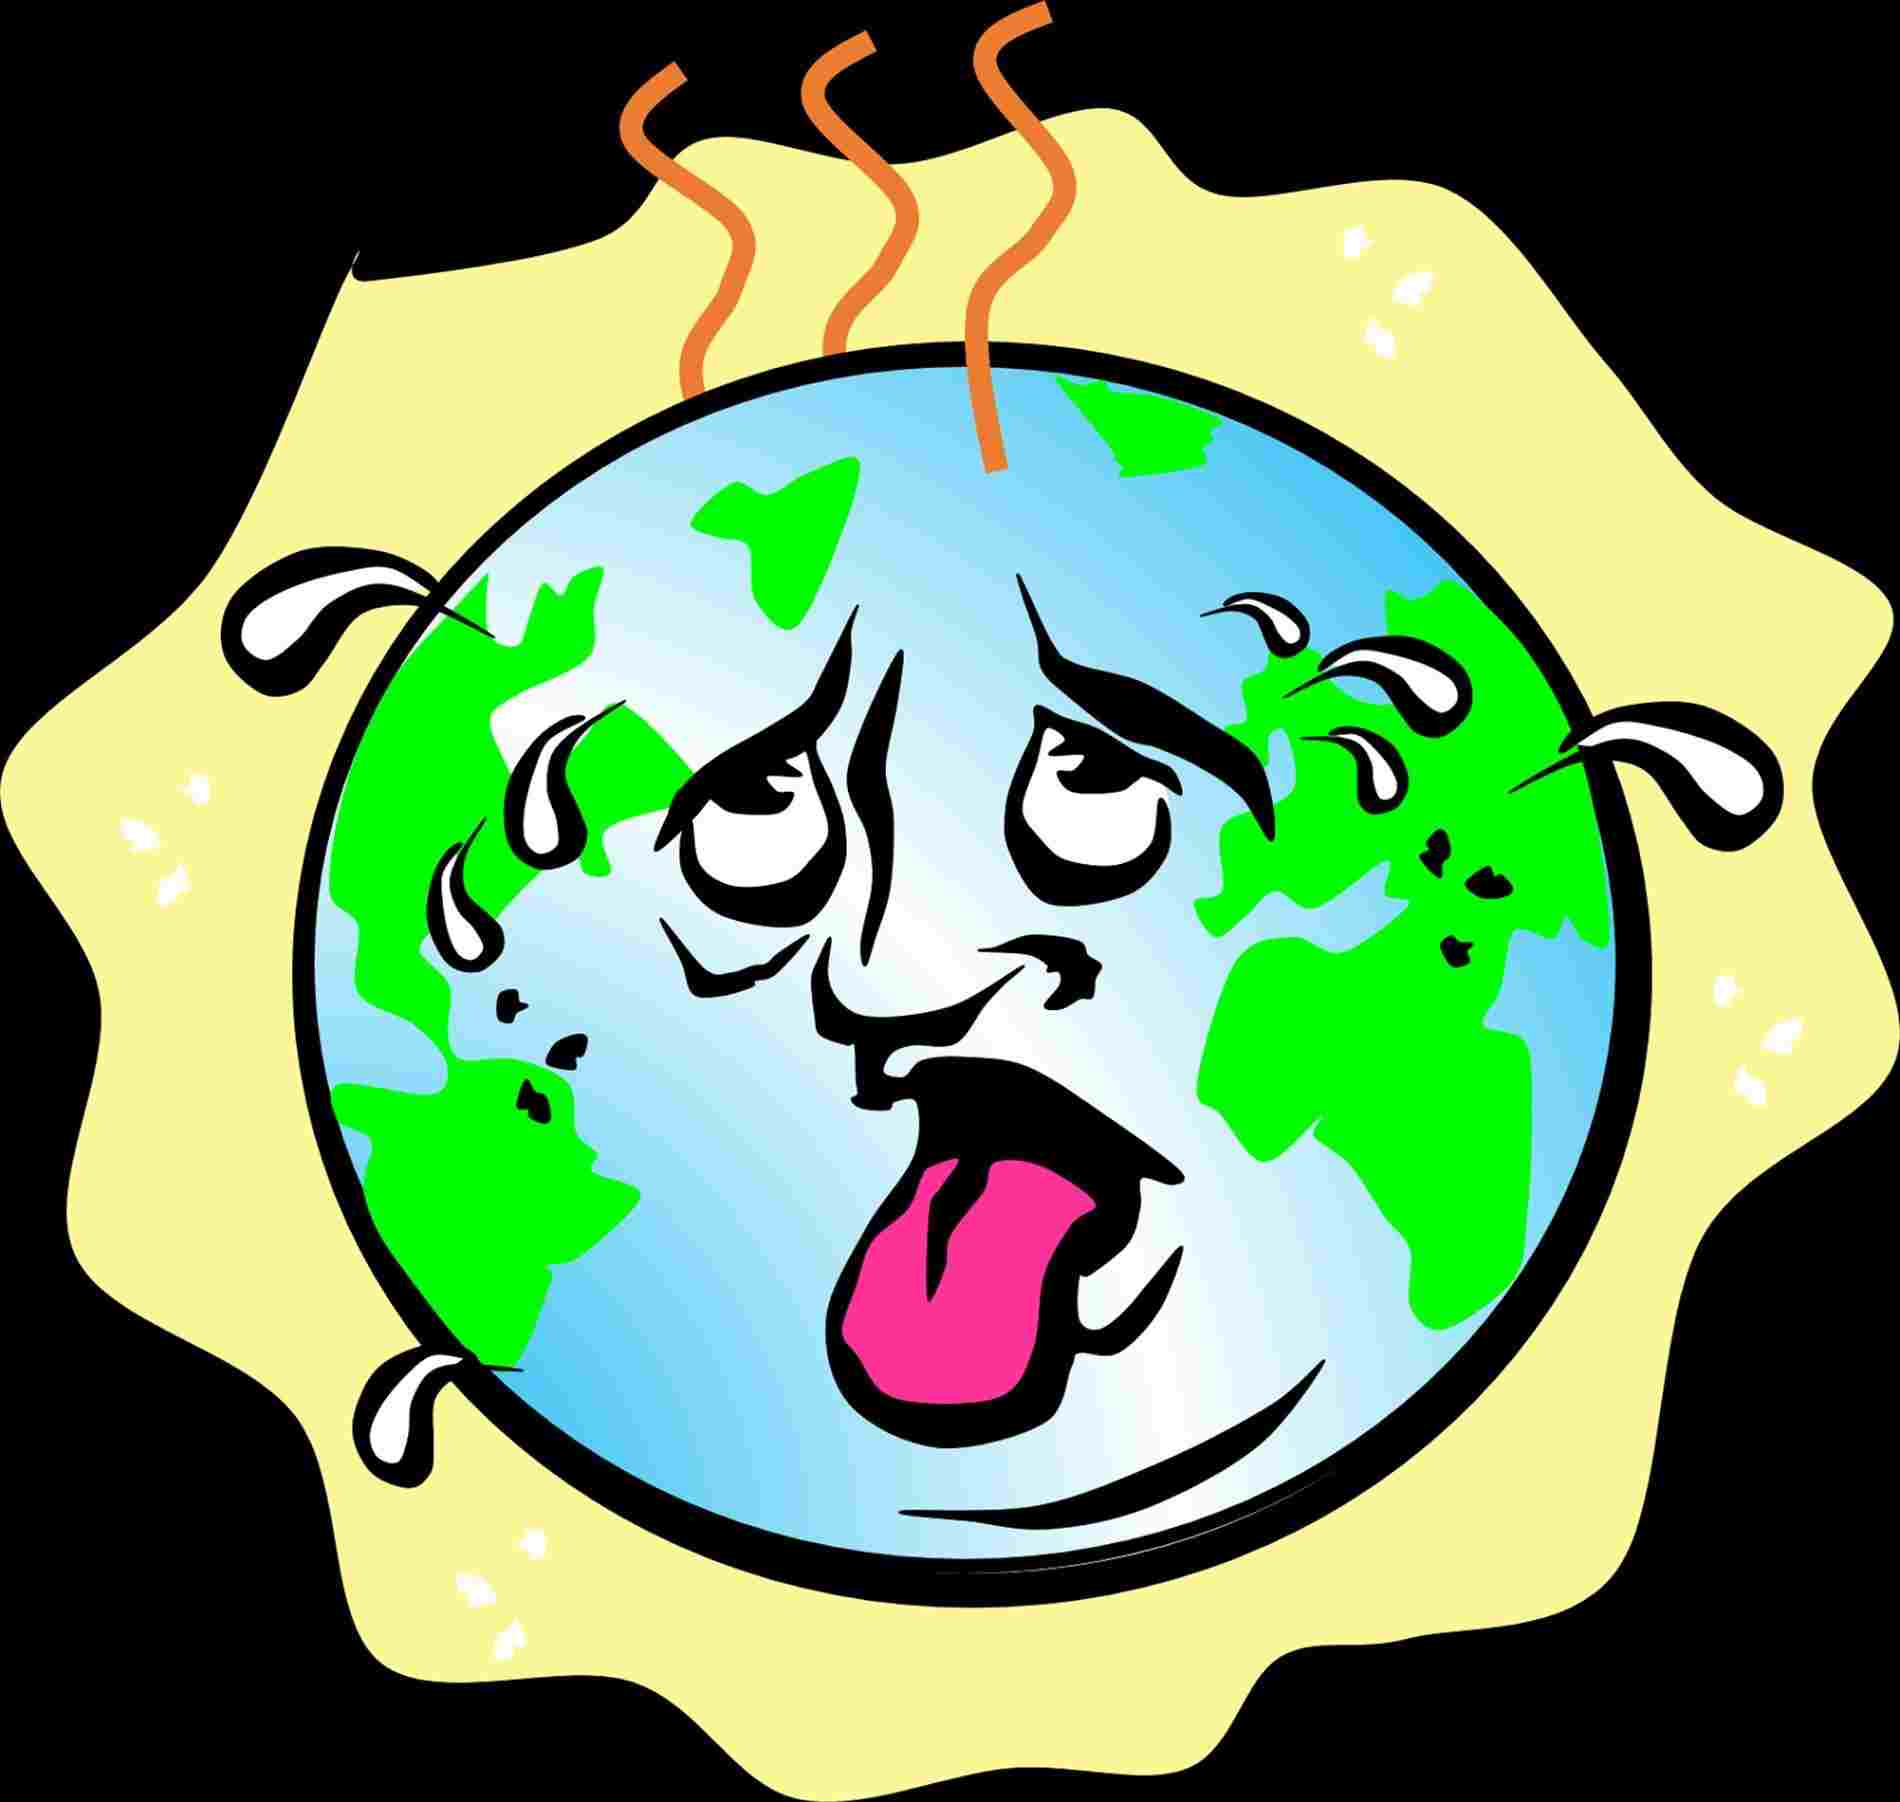 1900x1802 Poster Save Environment Drawing